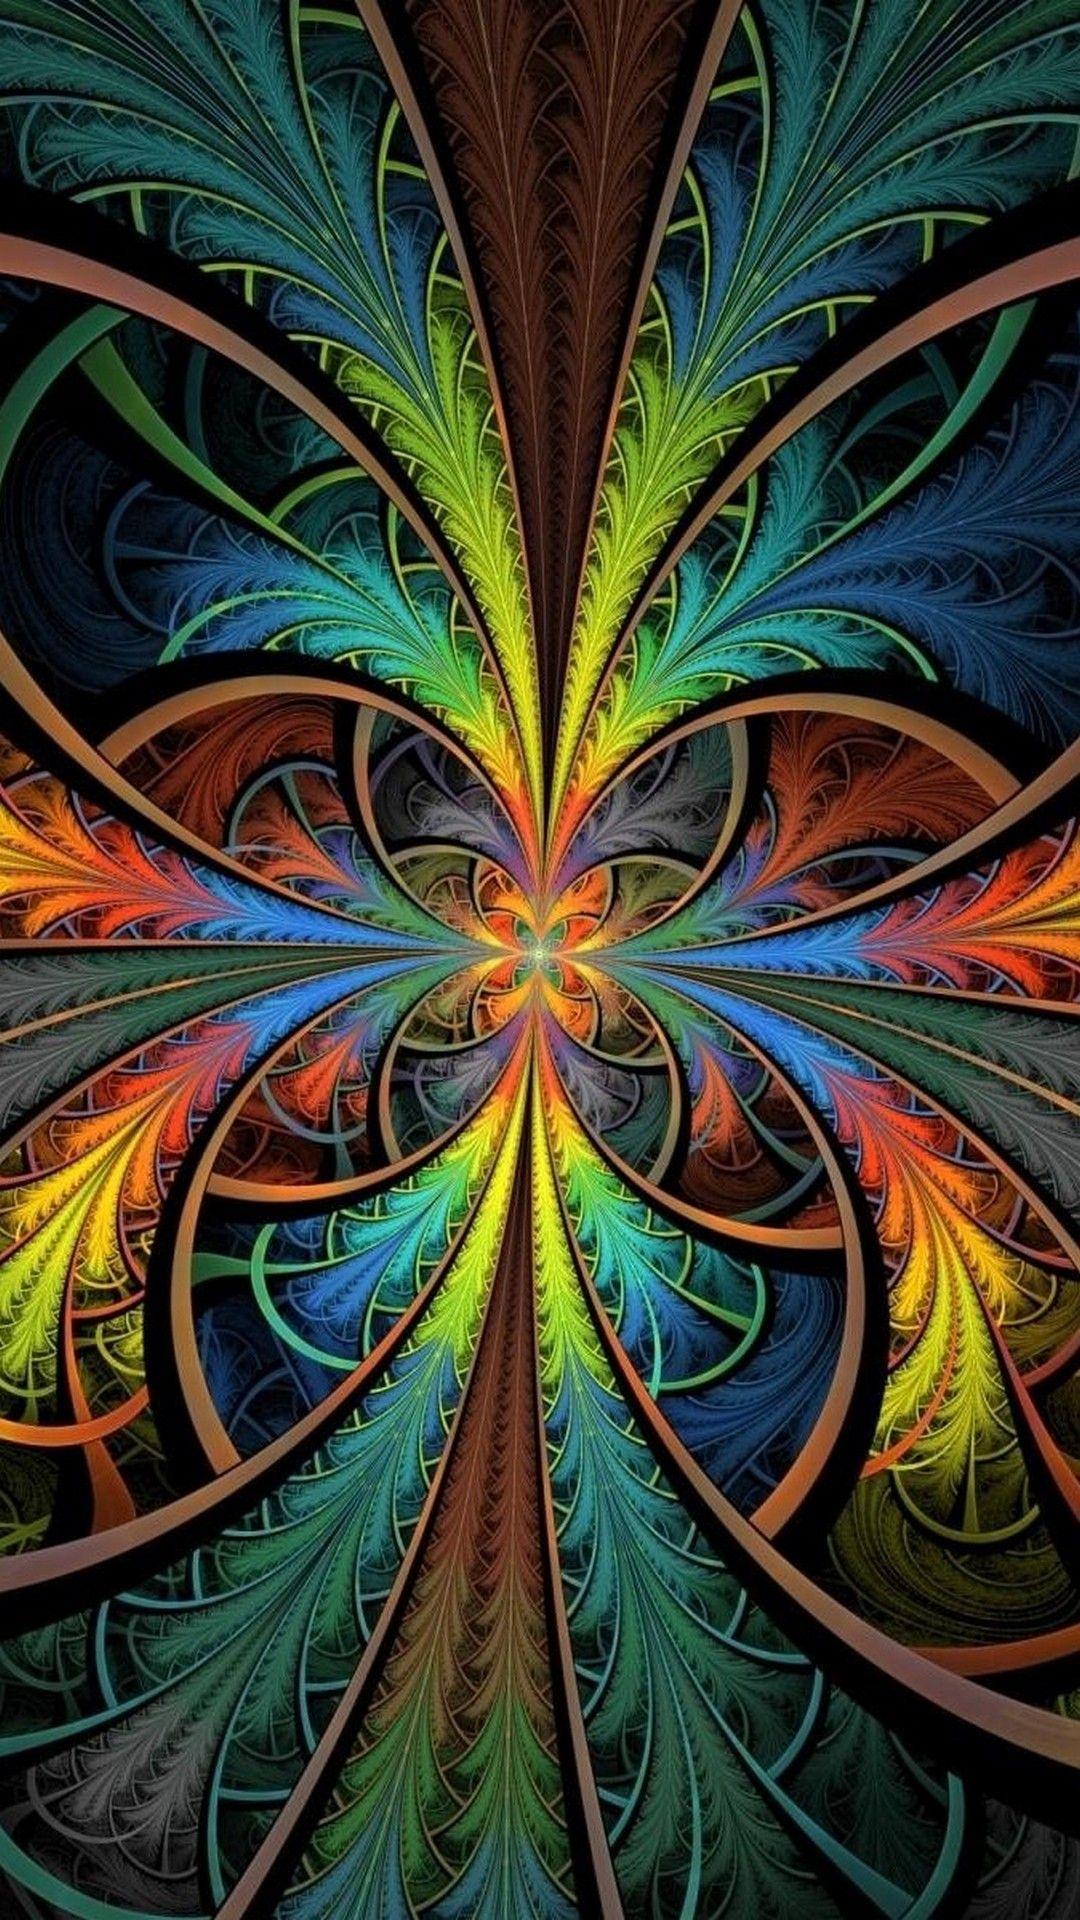 Psychedelic Wallpaper For iPhone Best iPhone Wallpaper